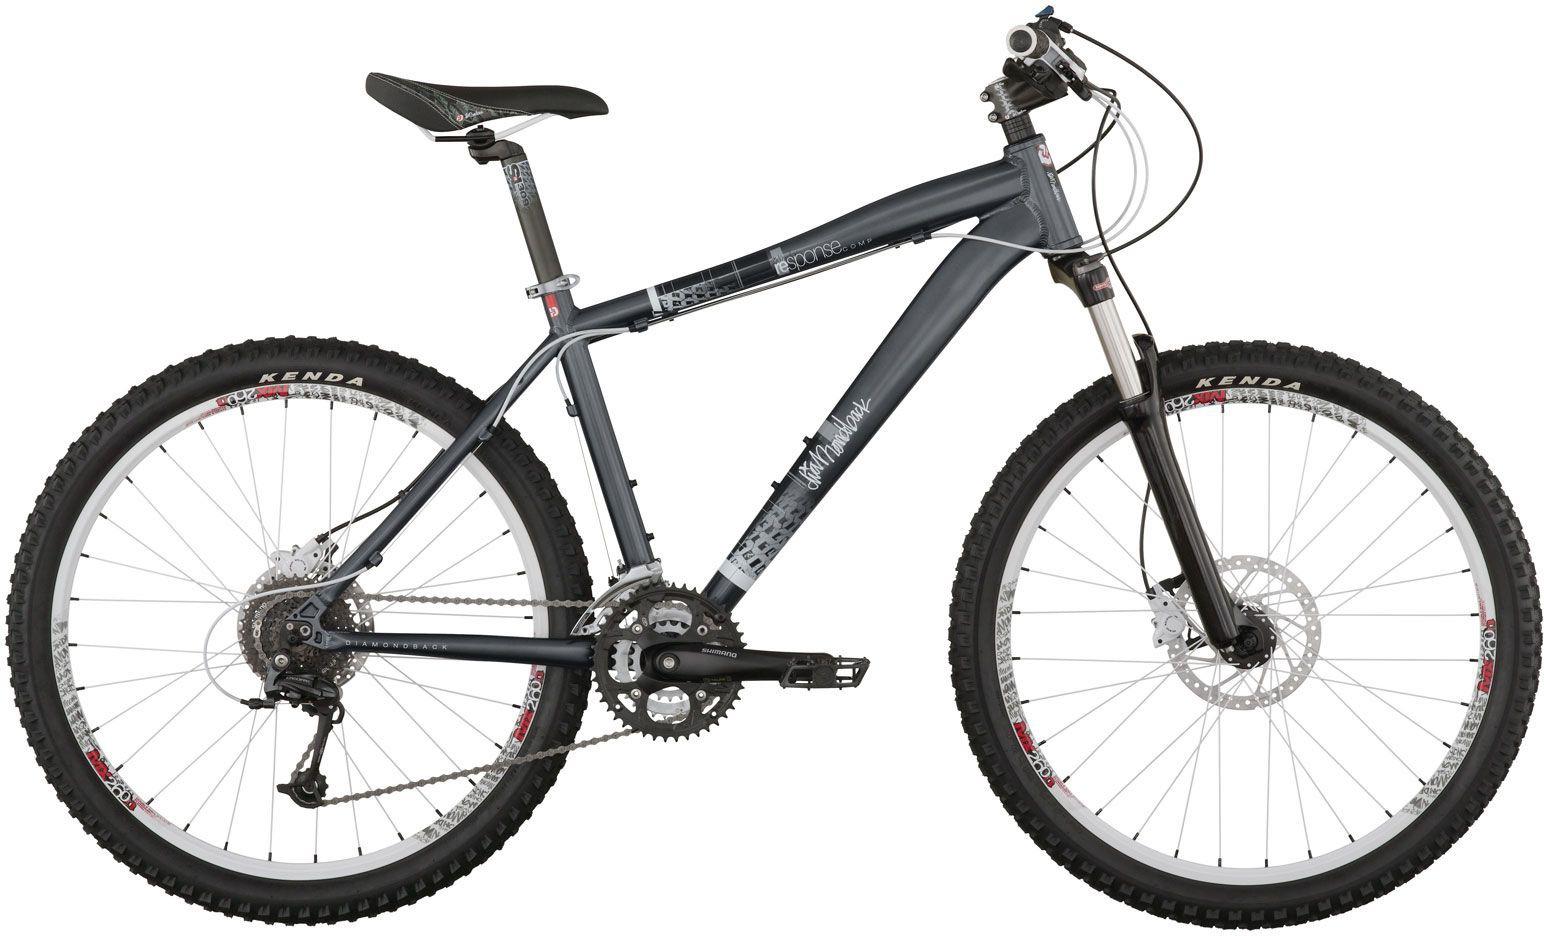 2011 Diamondback Response Comp Bicycle Details Bicyclebluebook Com